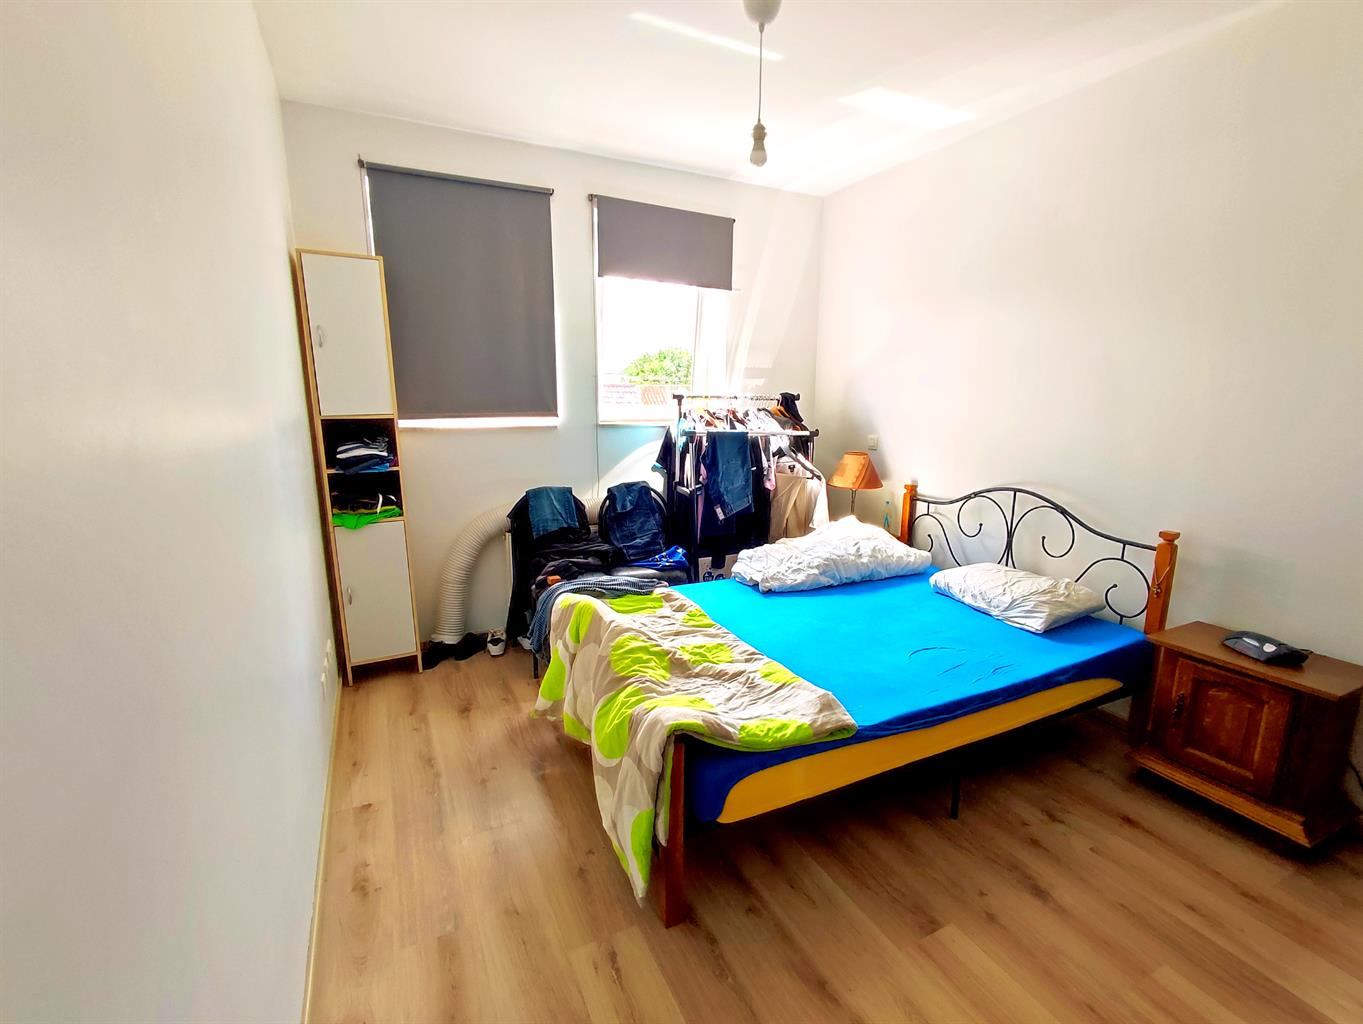 Appartement - Tournai - #4443089-2